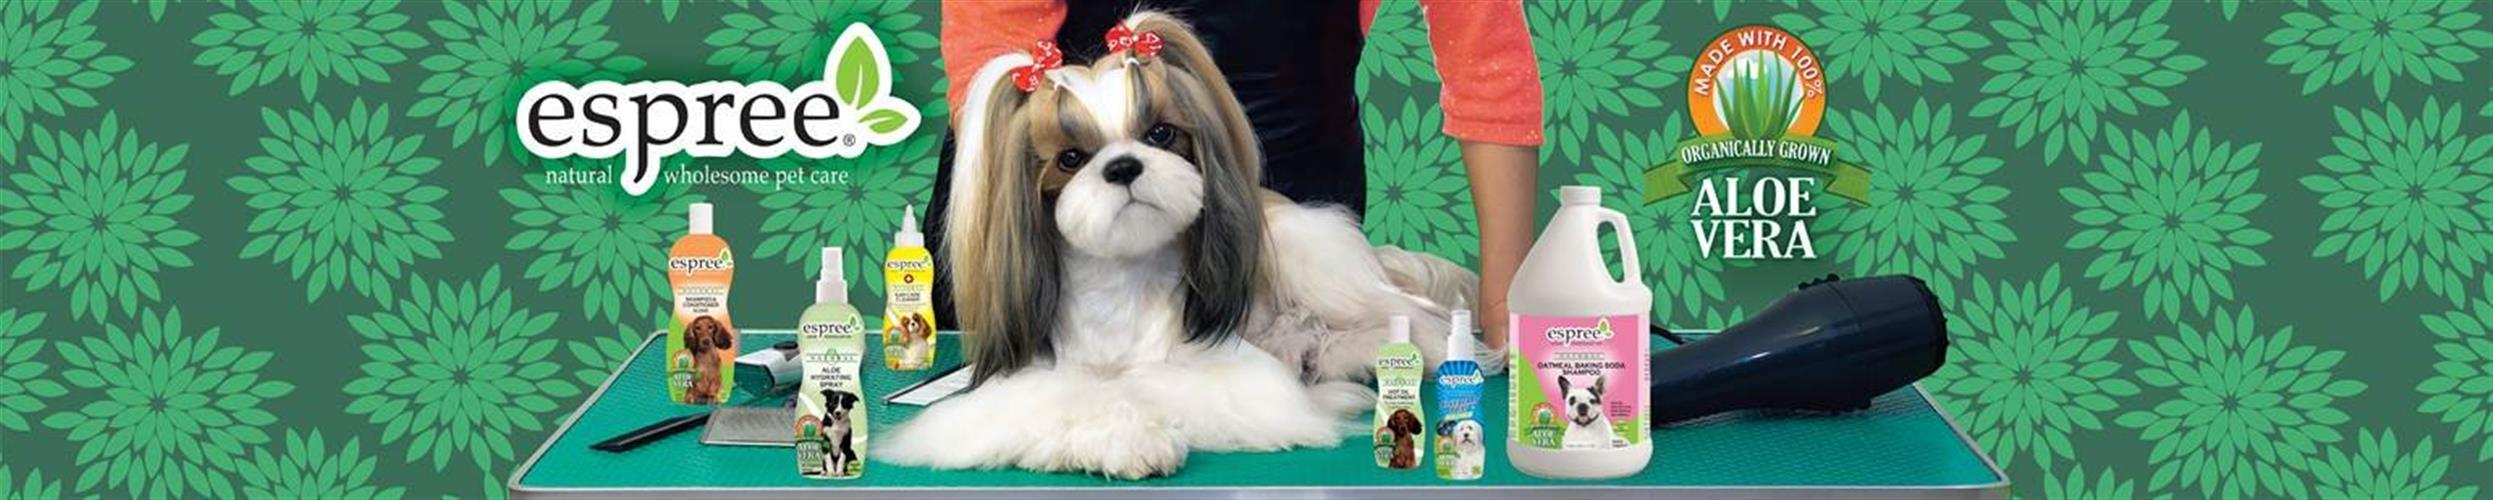 Espree Animal Products